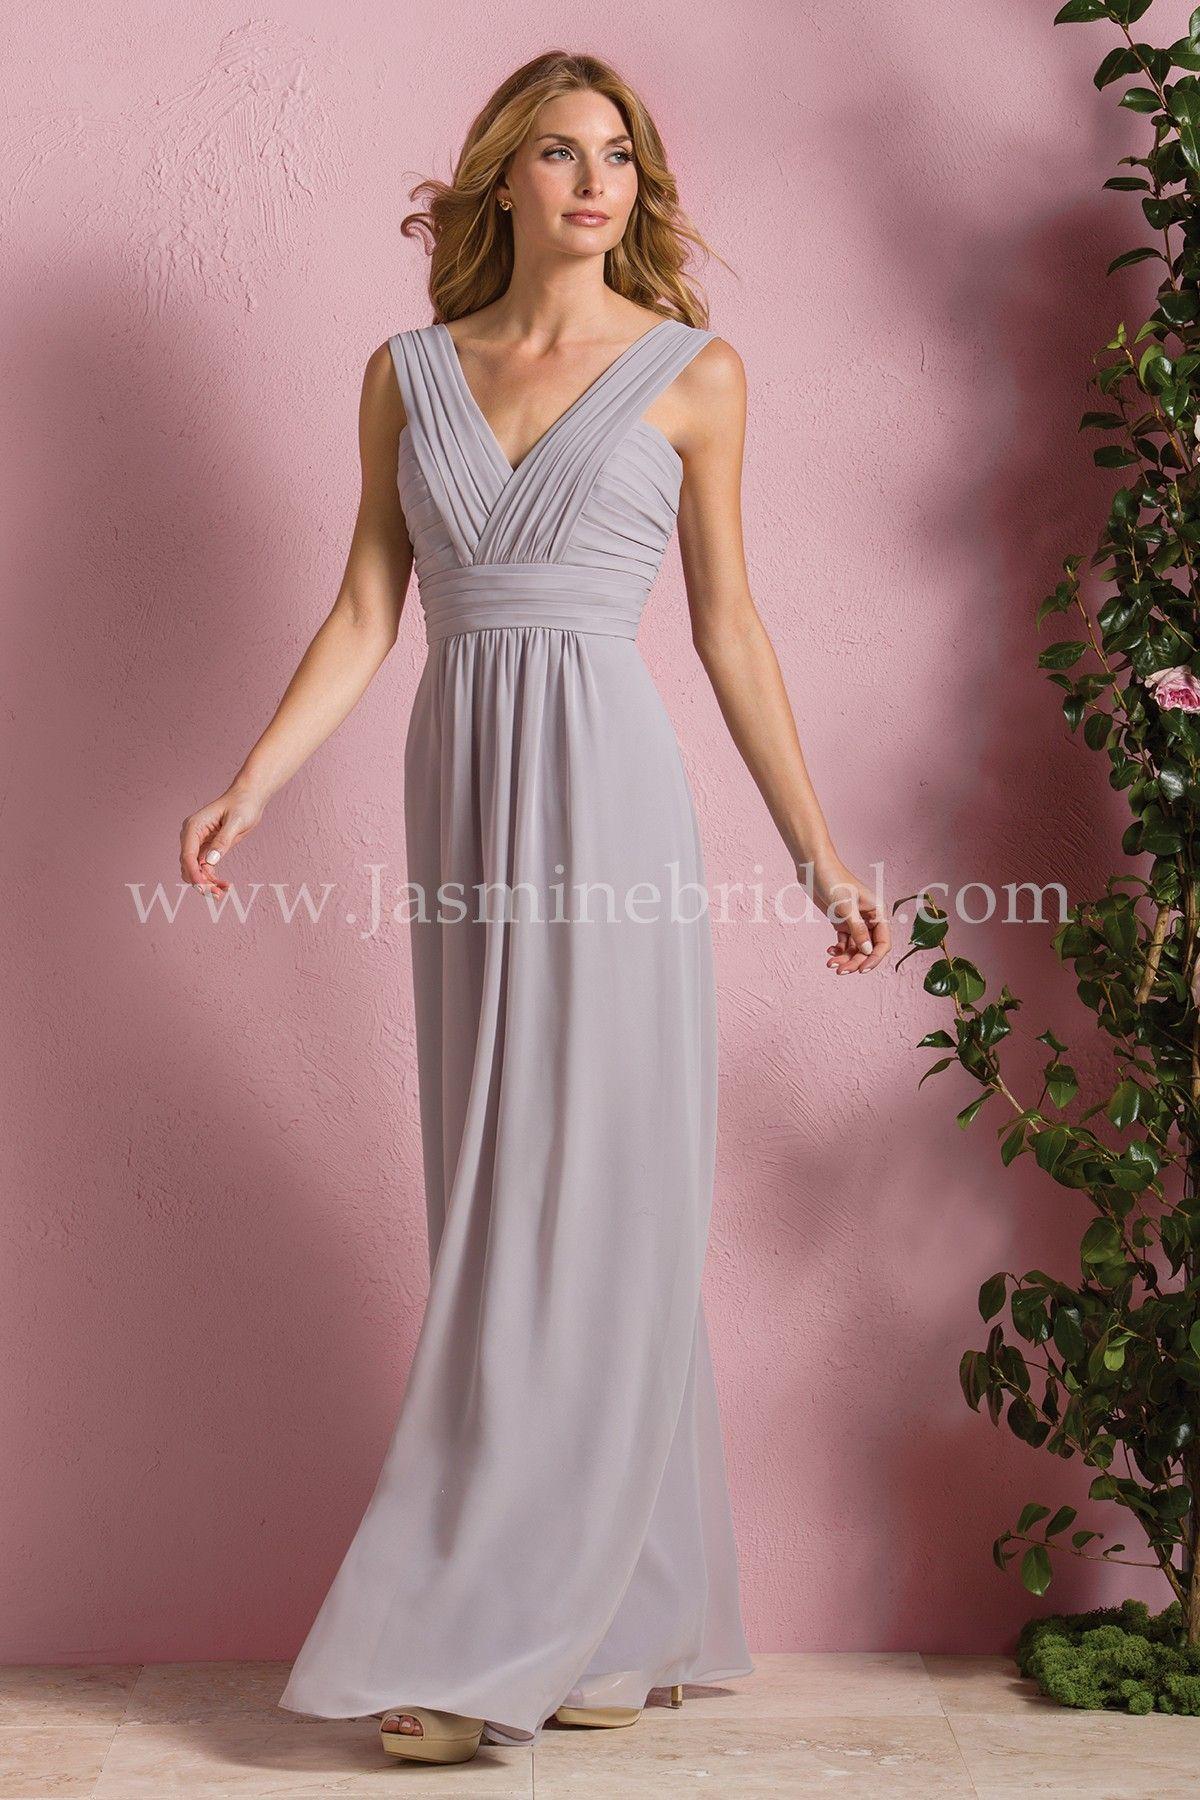 Jasmine bridal bridesmaid dress b2 style b173054 in graphite a jasmine bridal bridesmaid dress b2 style b173054 in graphite a simple bridesmaid dress that ombrellifo Images